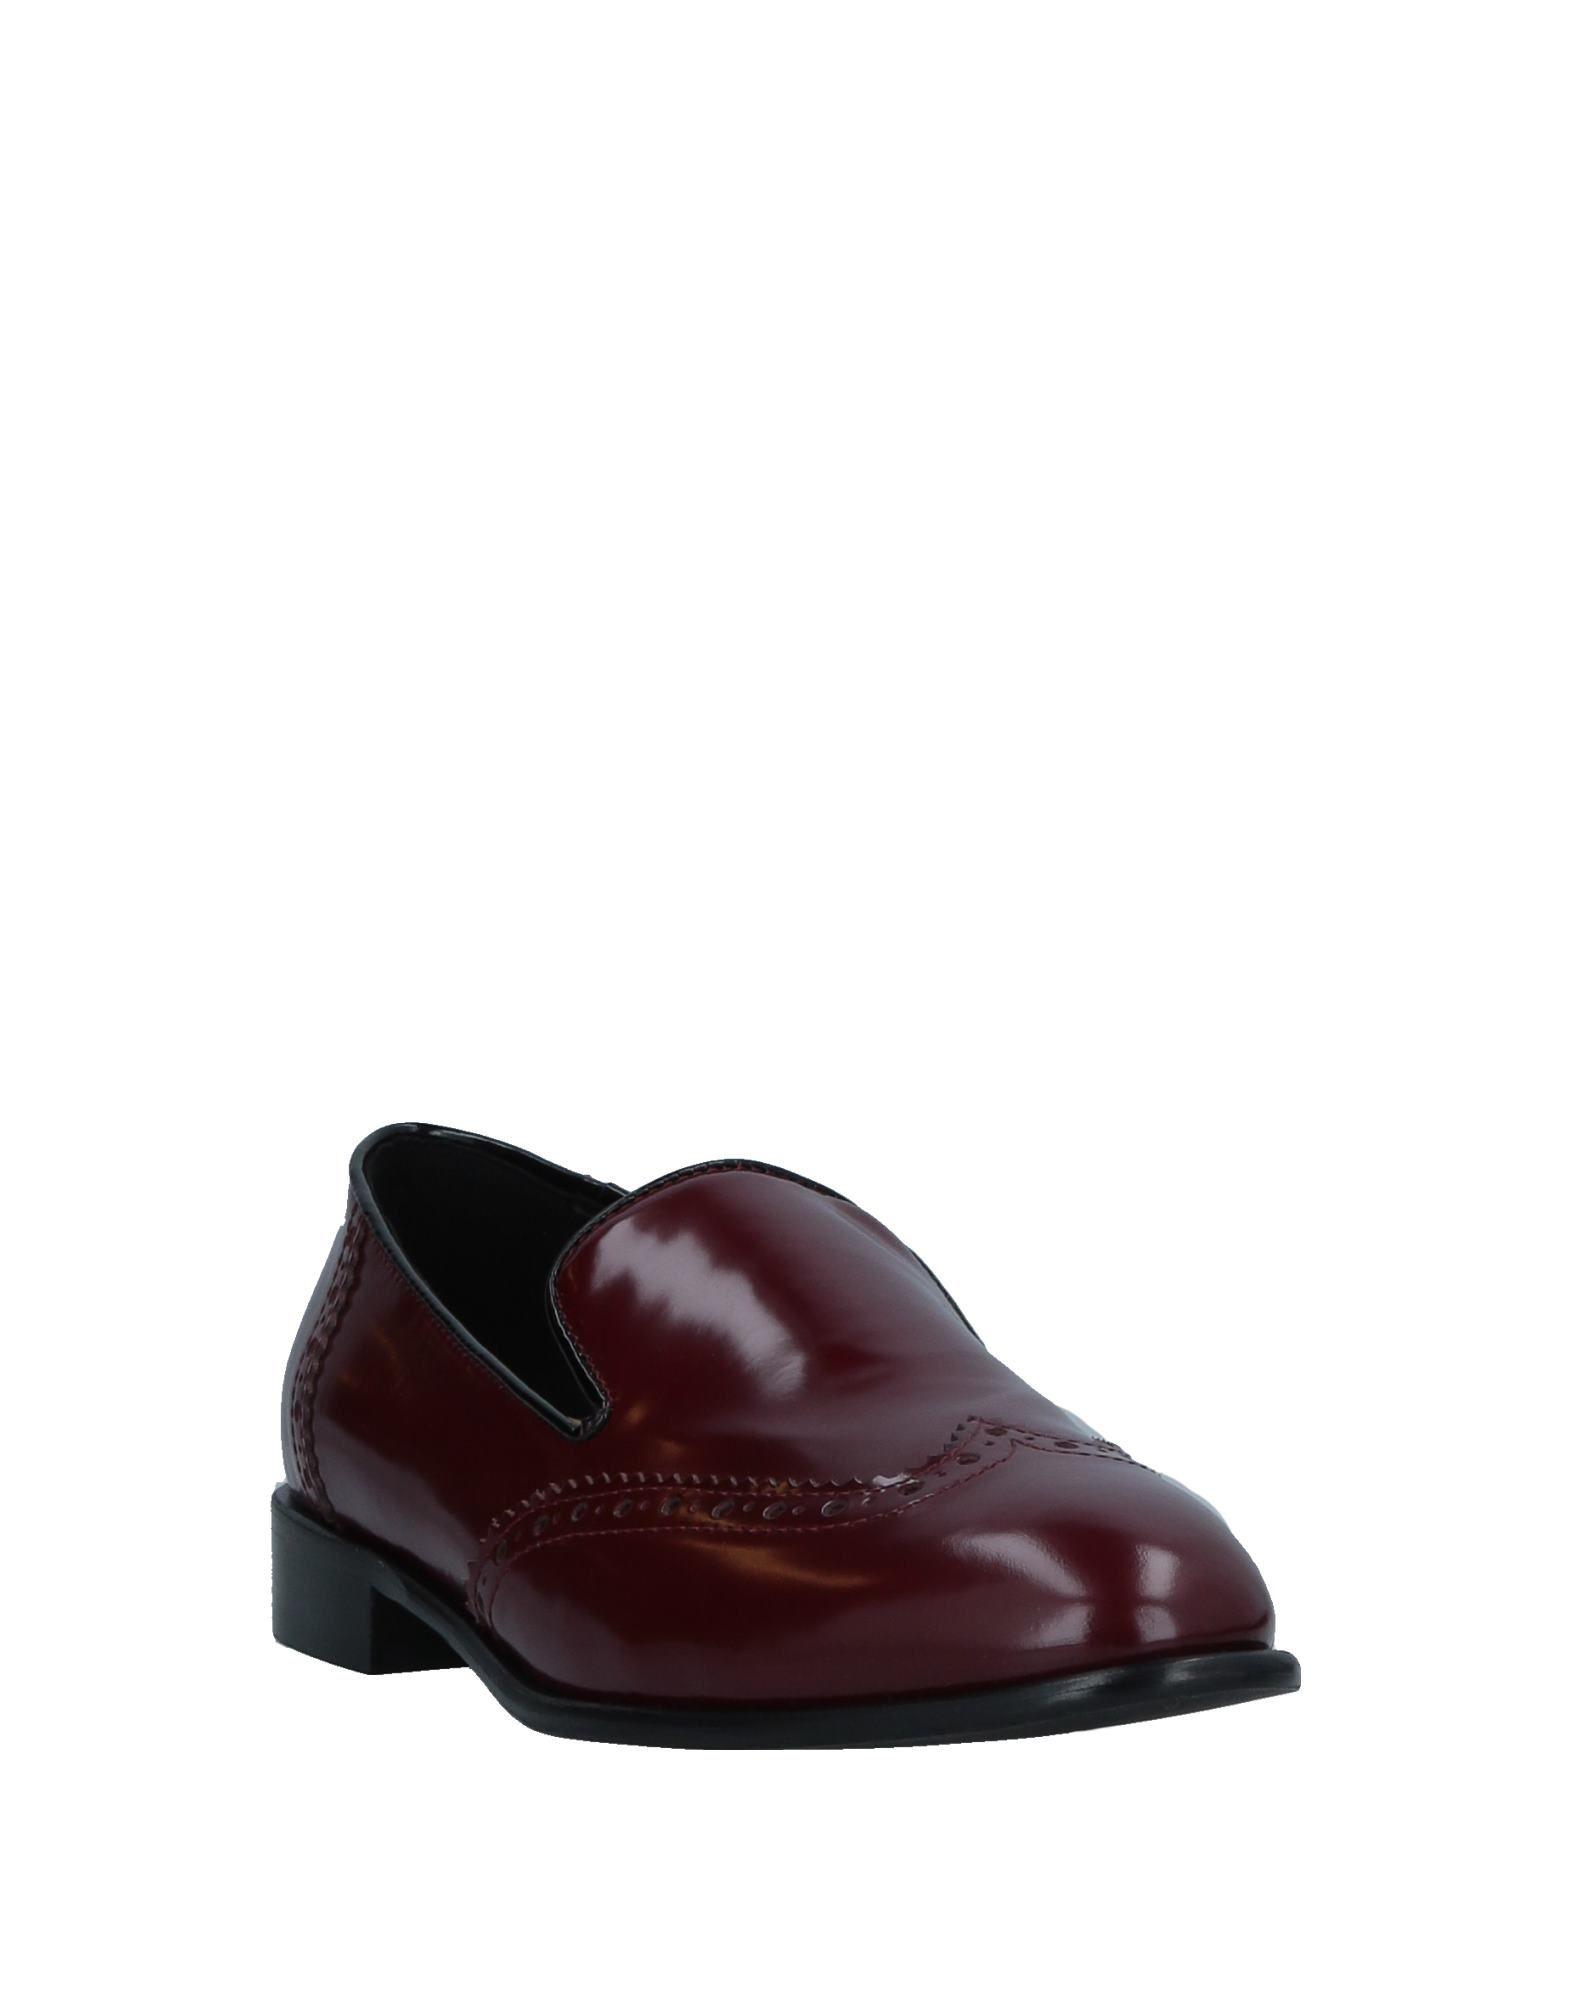 Fabio Rusconi Mokassins Damen 11532248KH  11532248KH Damen Gute Qualität beliebte Schuhe 2a3c1f